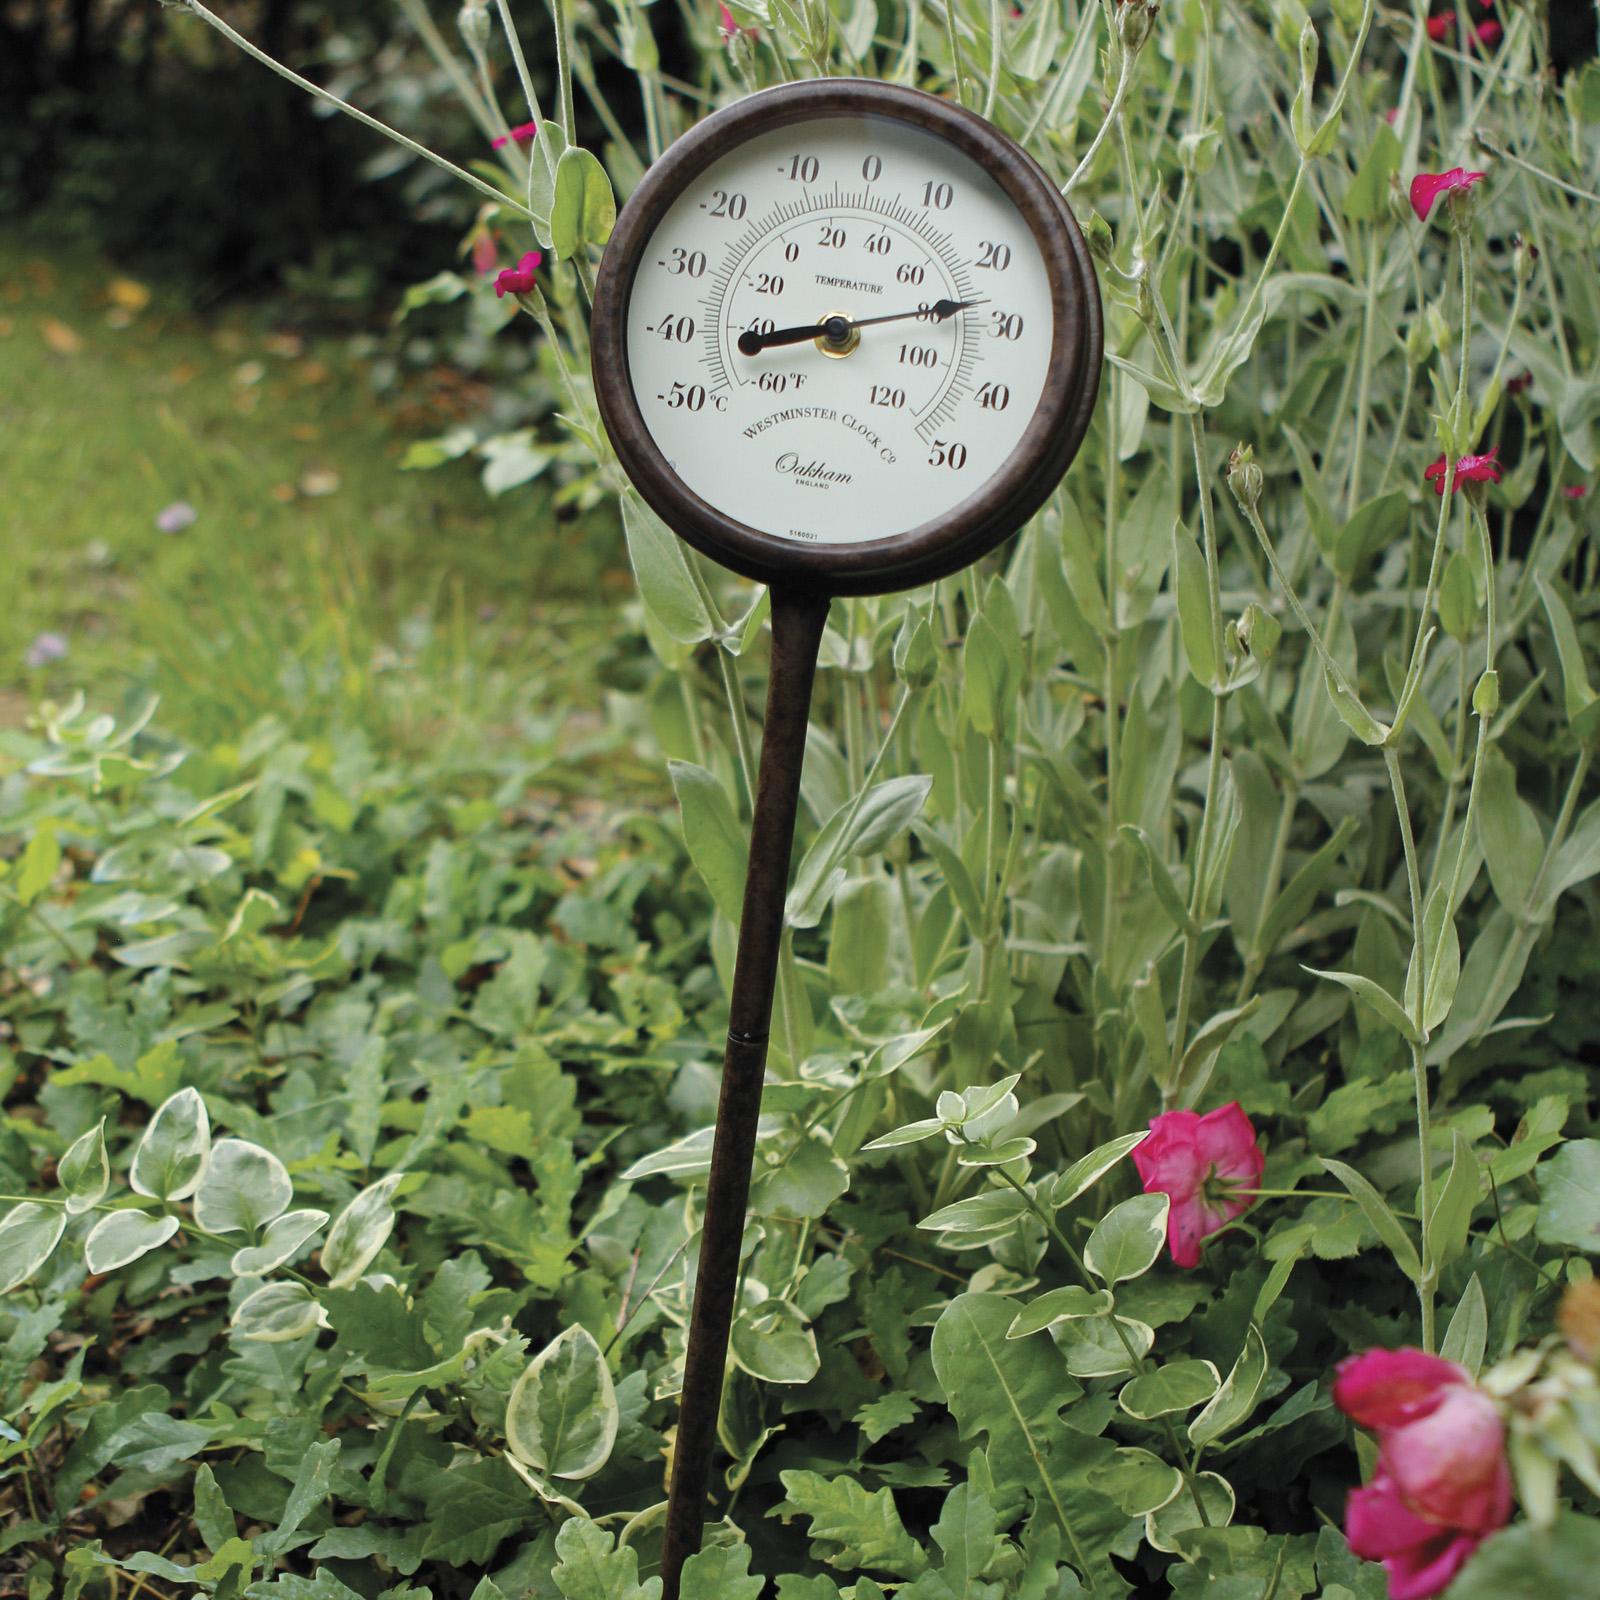 Thermomètre Kew Garden à Thermometre De Jardin